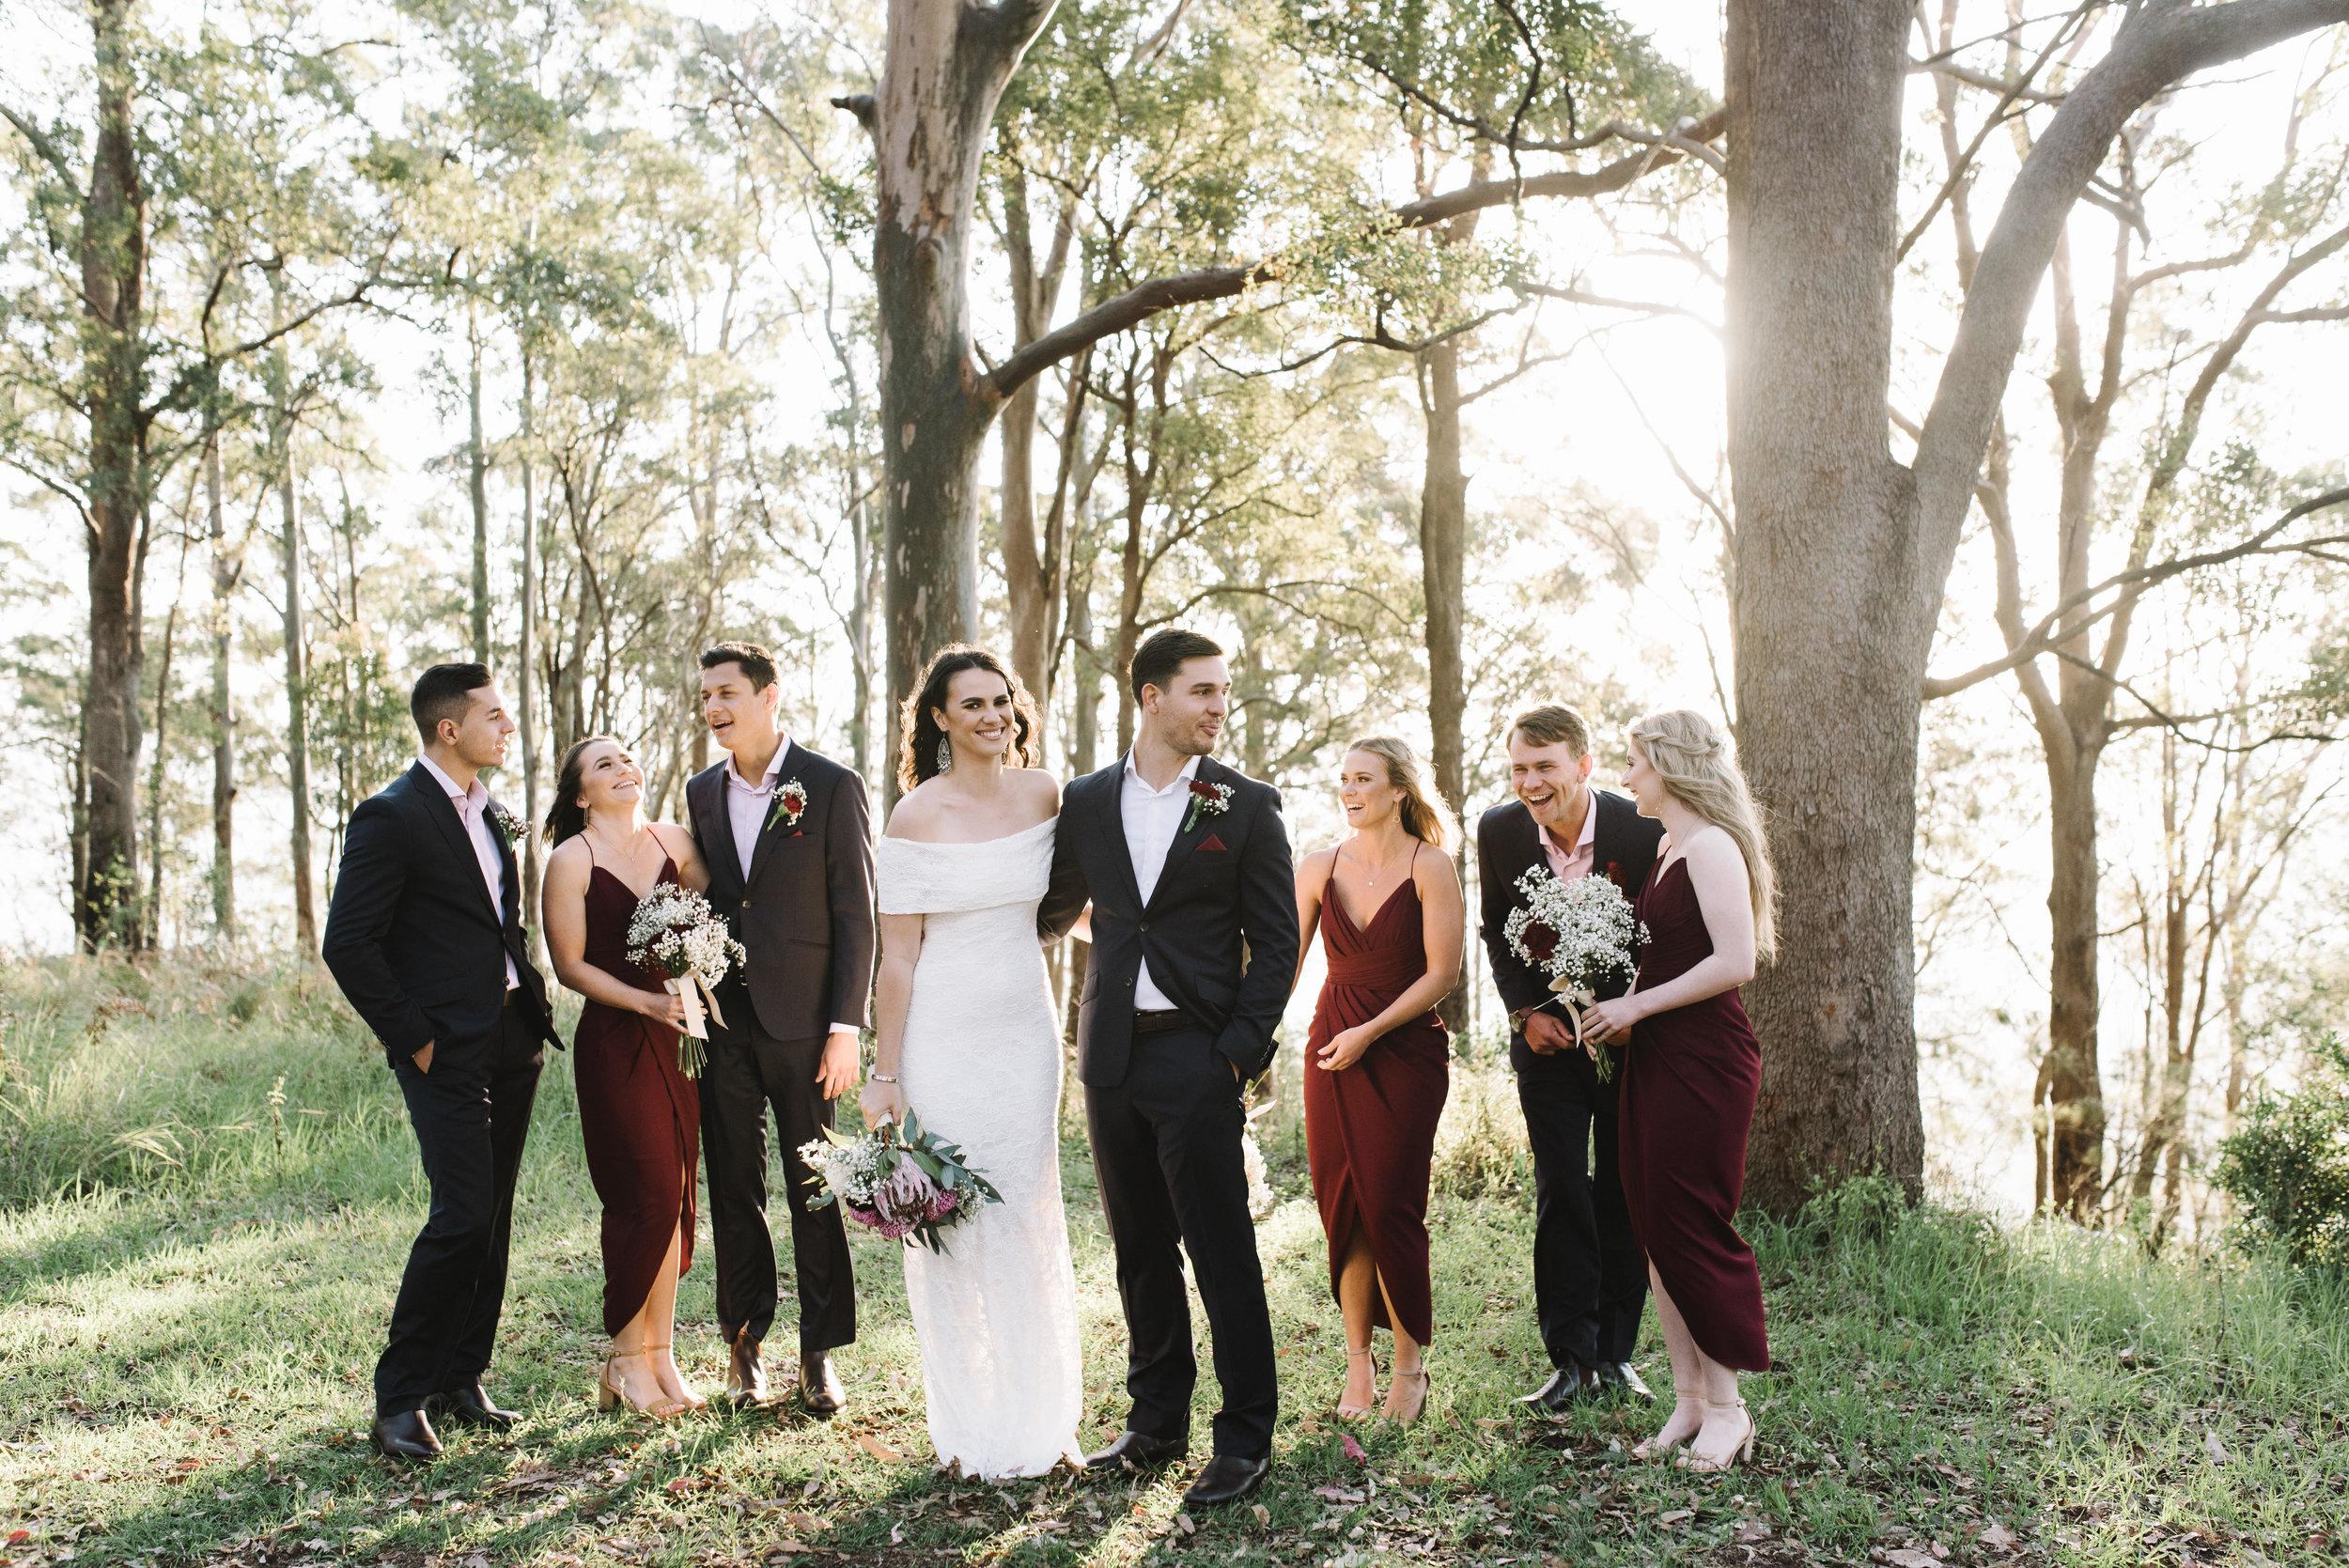 brisbane-gold-coast-sunshine-coast-wedding-photographer-mount-tamborine-wedding-1-56.jpg